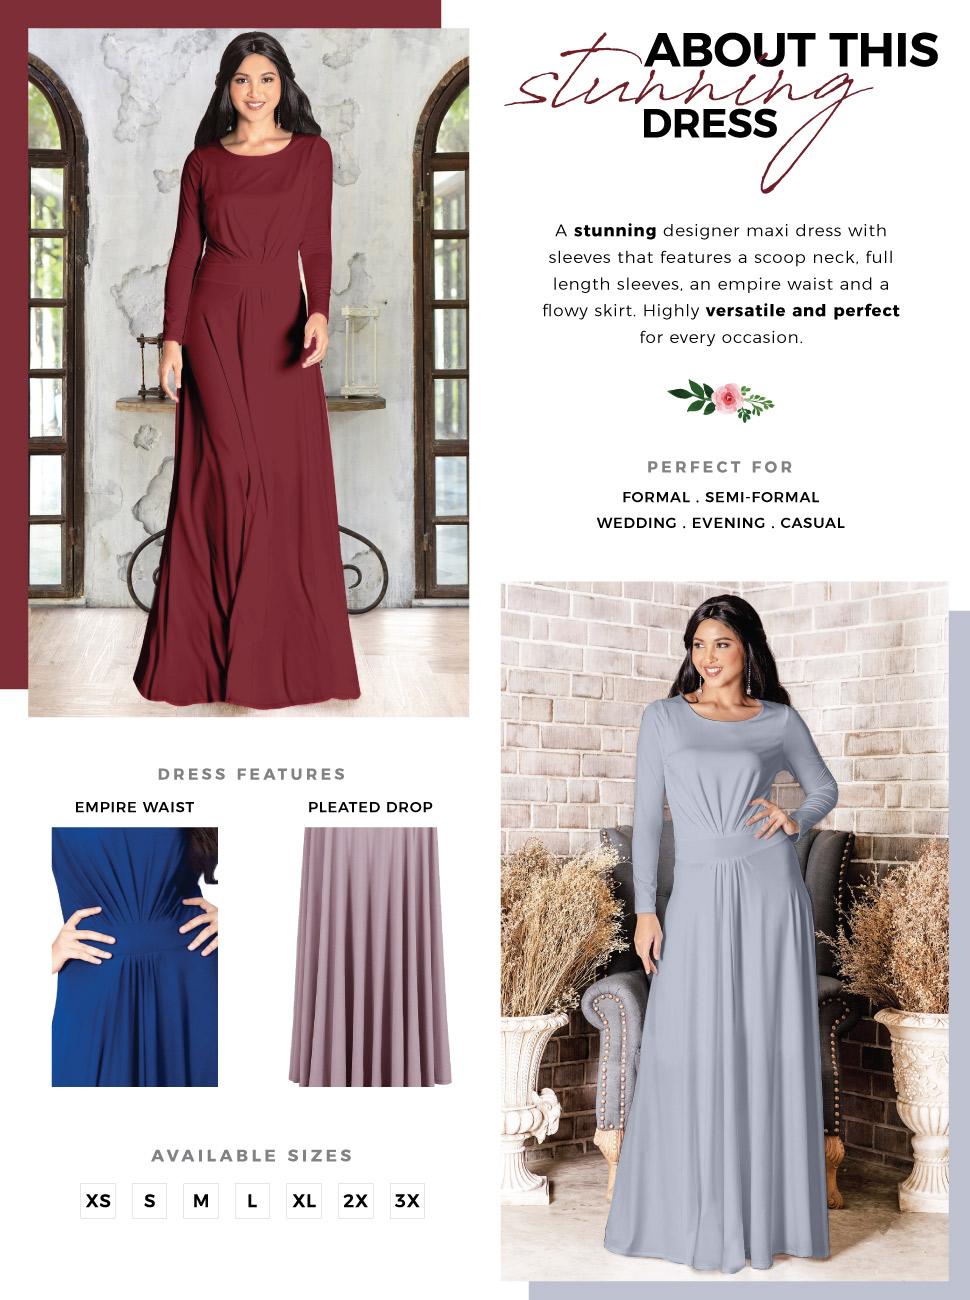 88c2a5806c7 Sleeve Flowy Empire Waist Fall Winter Party Gown. womens ladies elegant  stunning maxi dress ...